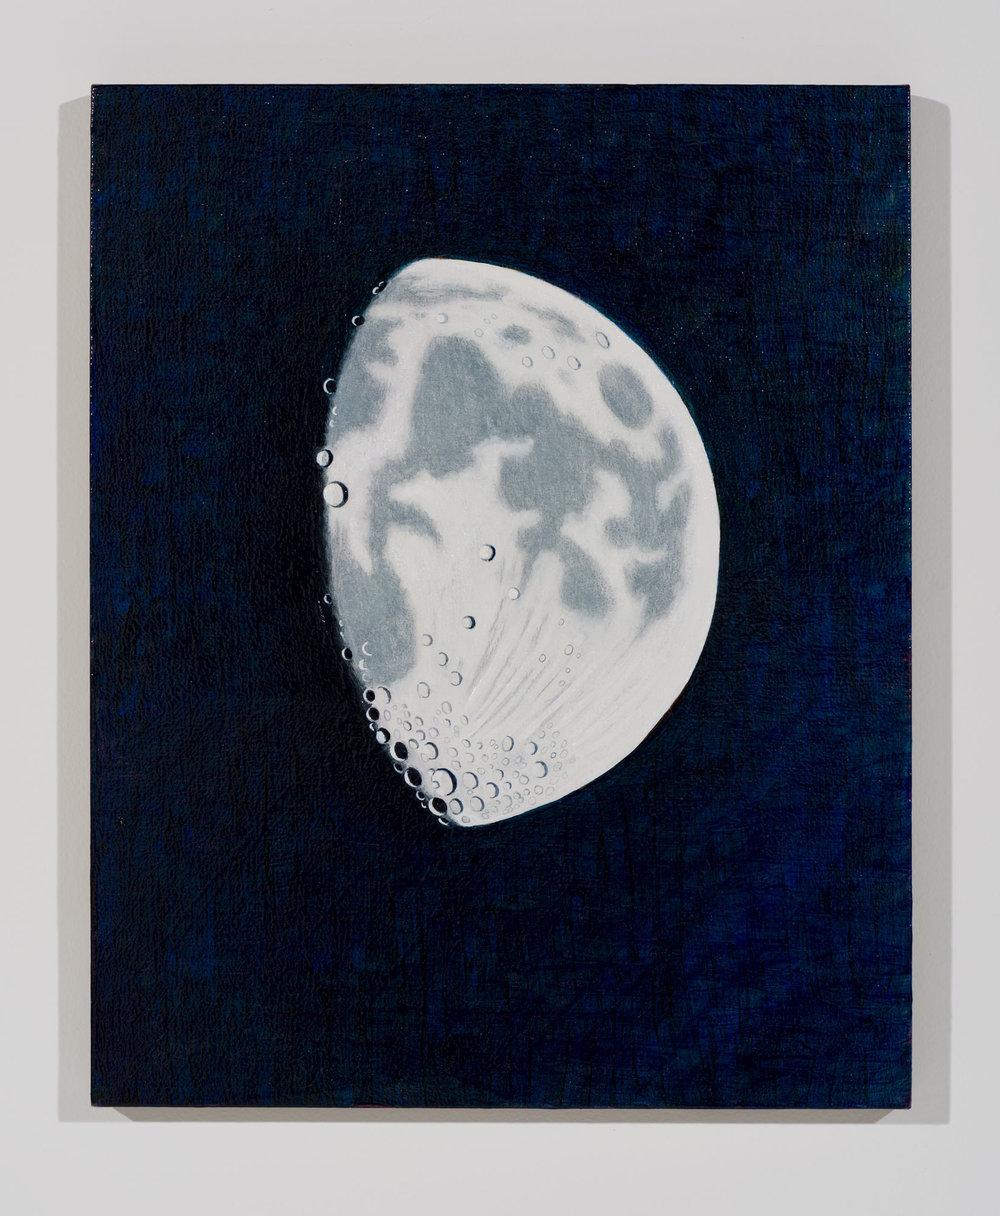 The Moon, 8.20.18